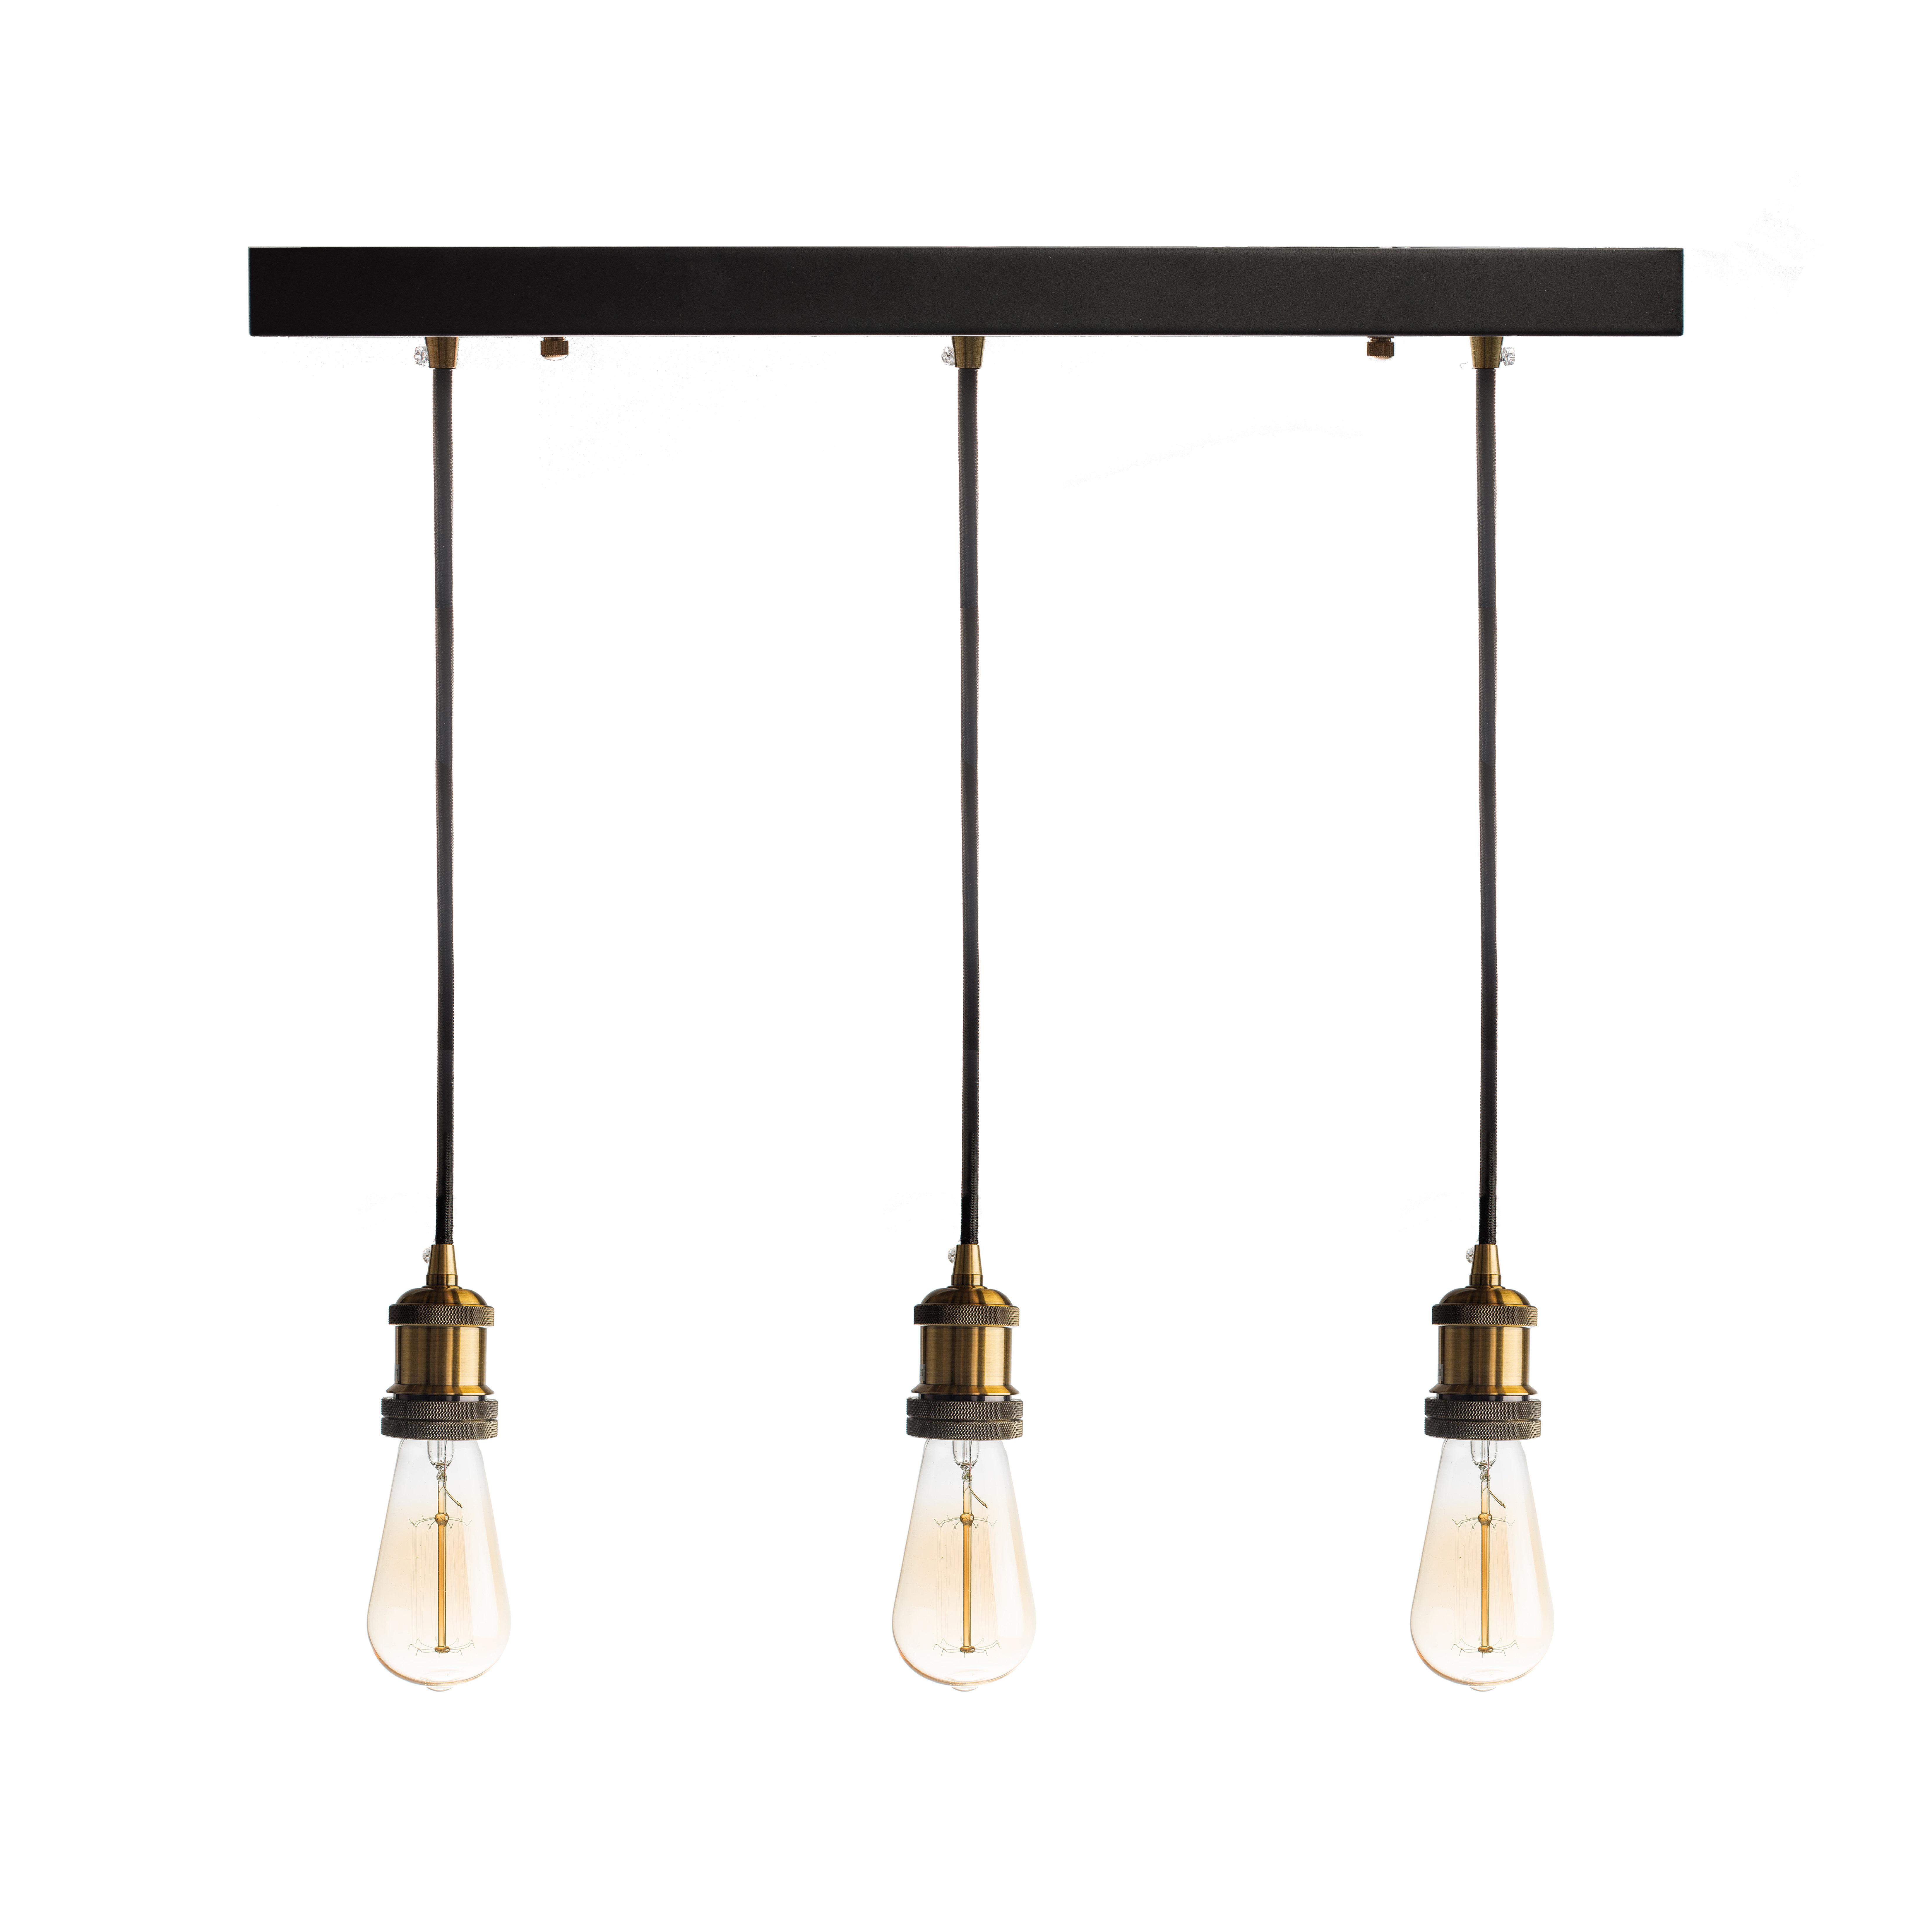 Fabian 3 Light Kitchen Island Bulb Pendant Throughout Fashionable Novogratz Vintage 5 Light Kitchen Island Bulb Pendants (View 4 of 25)